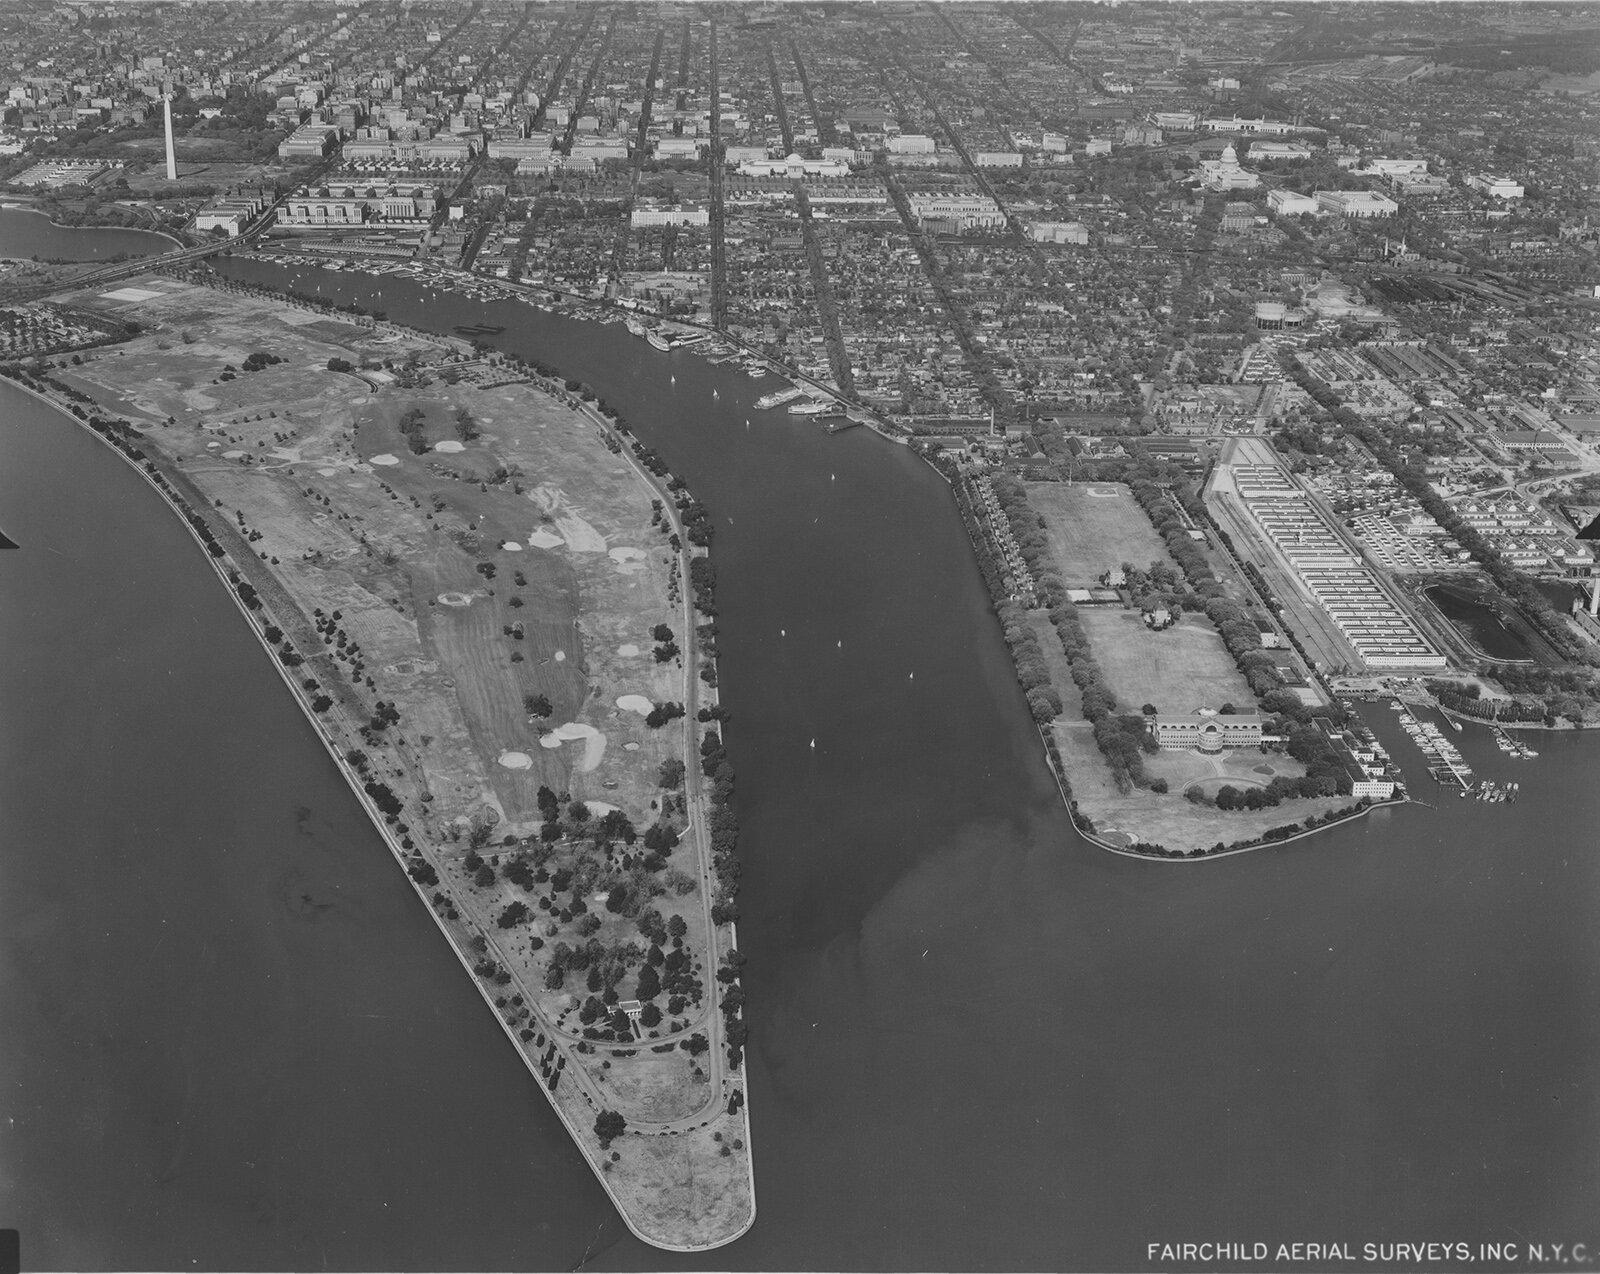 1600NCRO_Photos_S01_B019_East_Potomac_Park_Aerial_Views_1928-1980_872-B.jpg